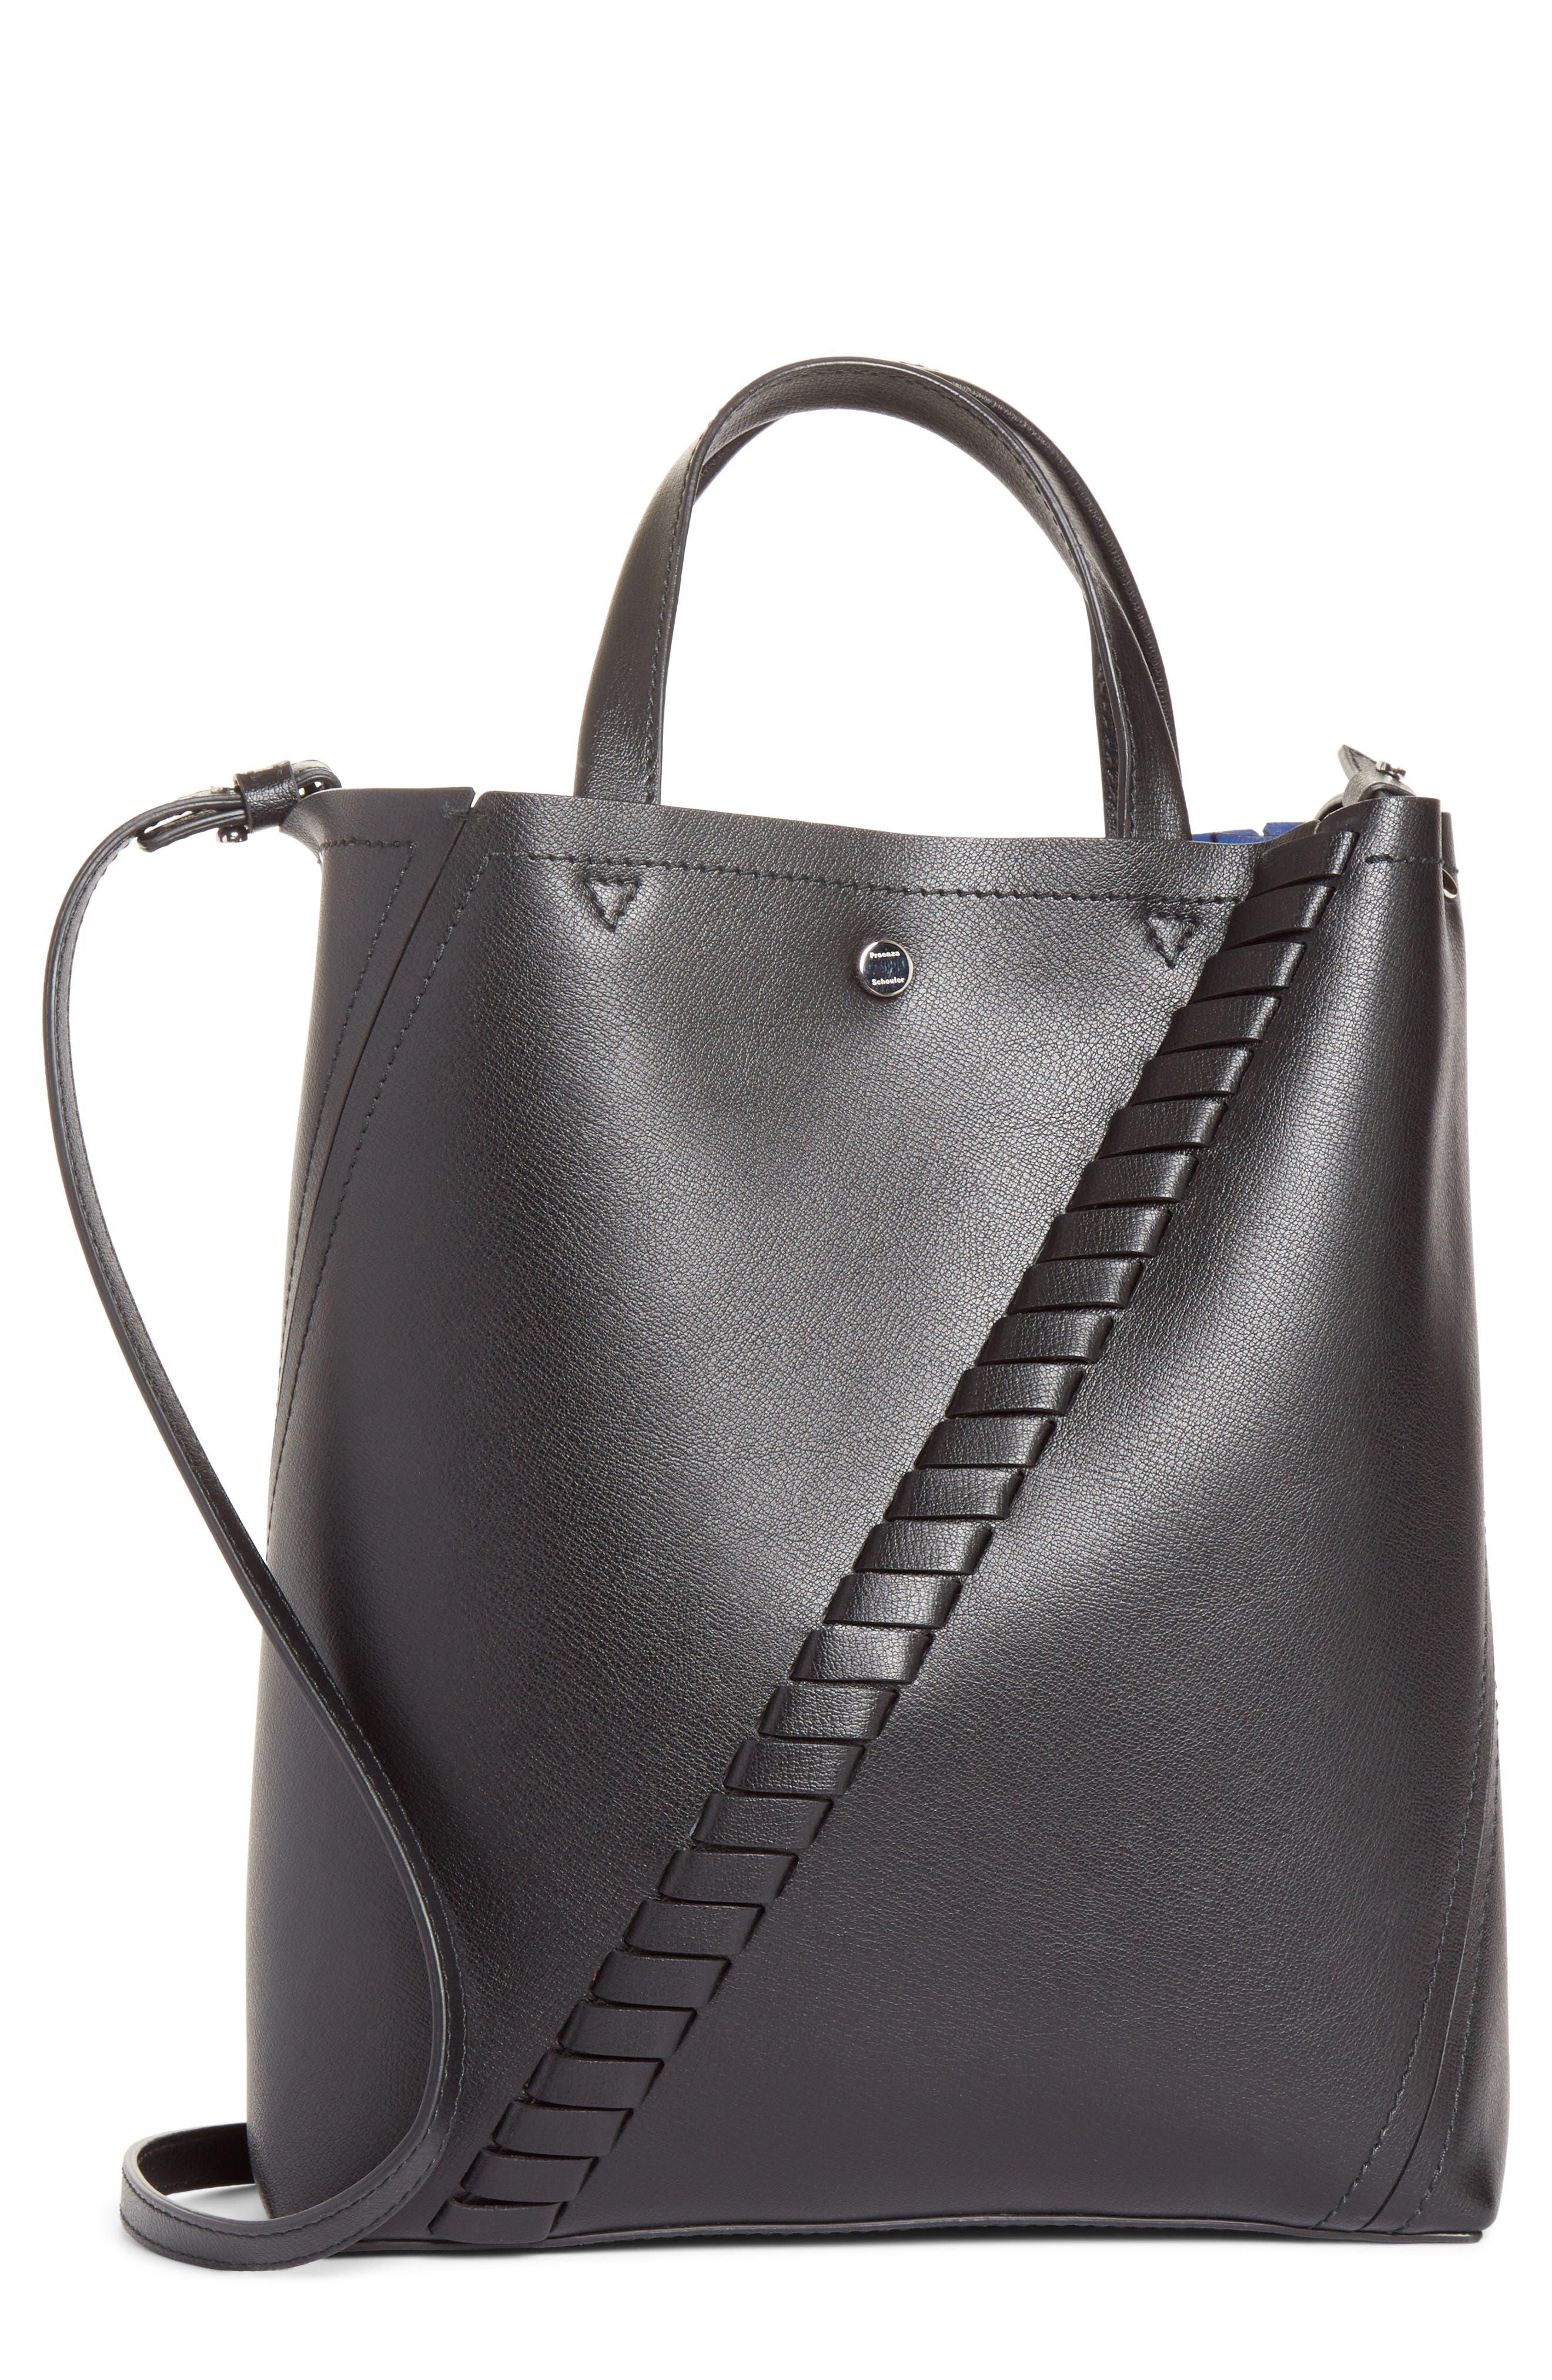 Alternate Image 1 Selected - Proenza Schouler Mini Hex Whipstitch Calfskin Leather Tote